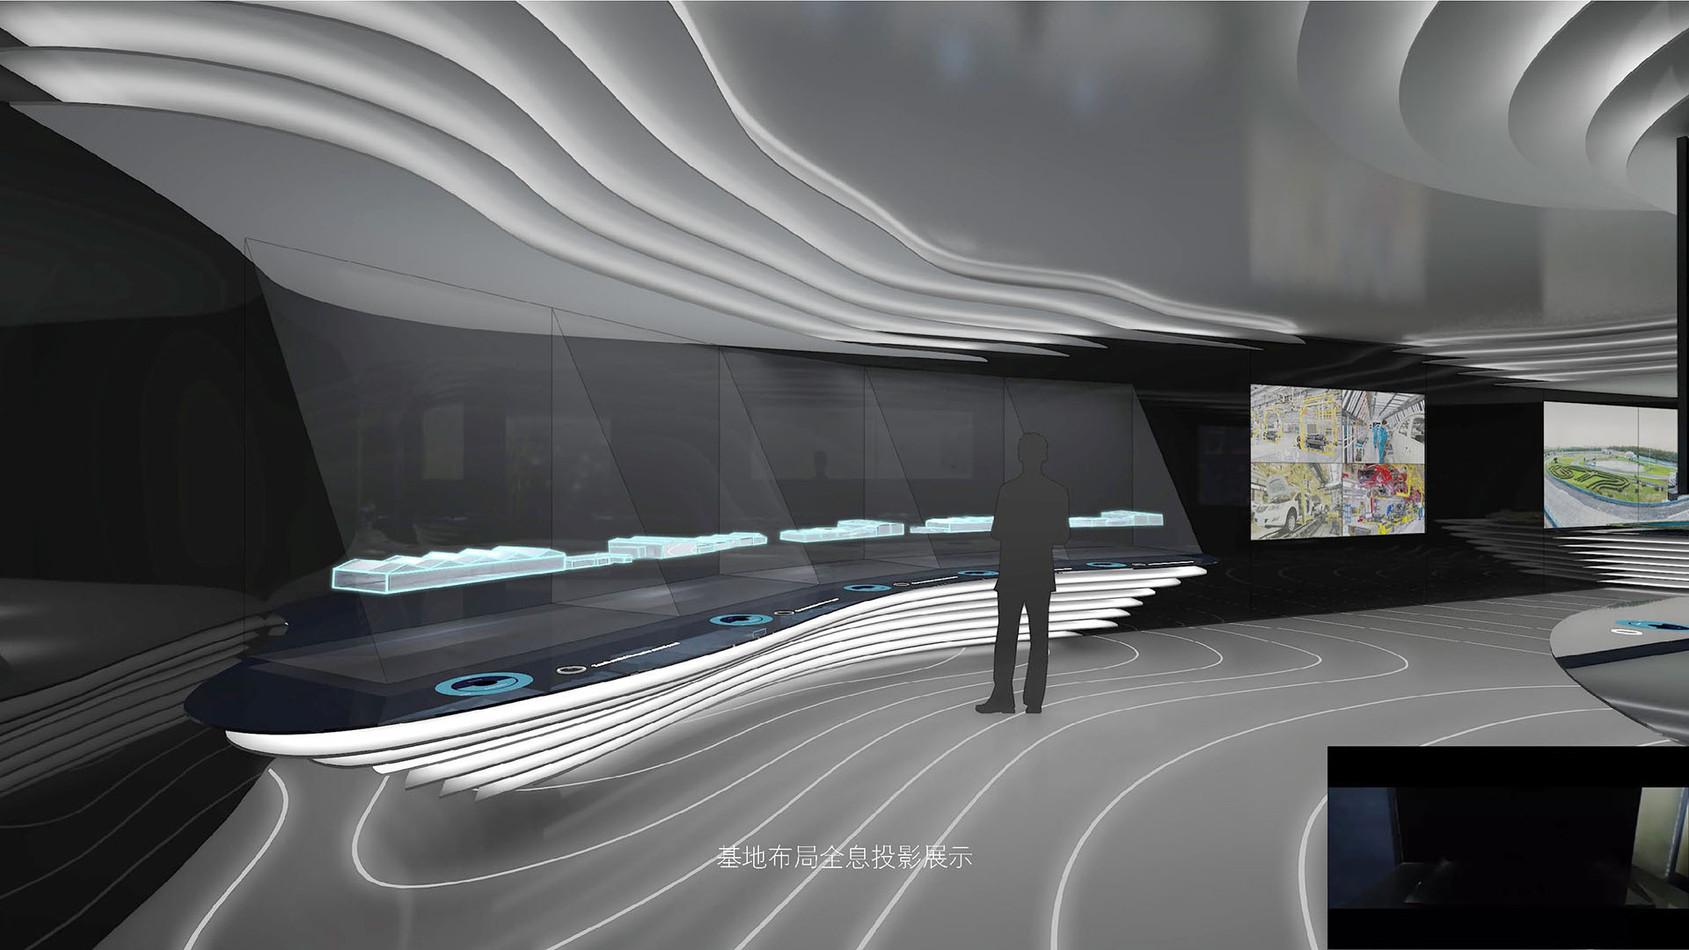 SGM-CORPORATE-MUSEUM-ZH 13.jpg